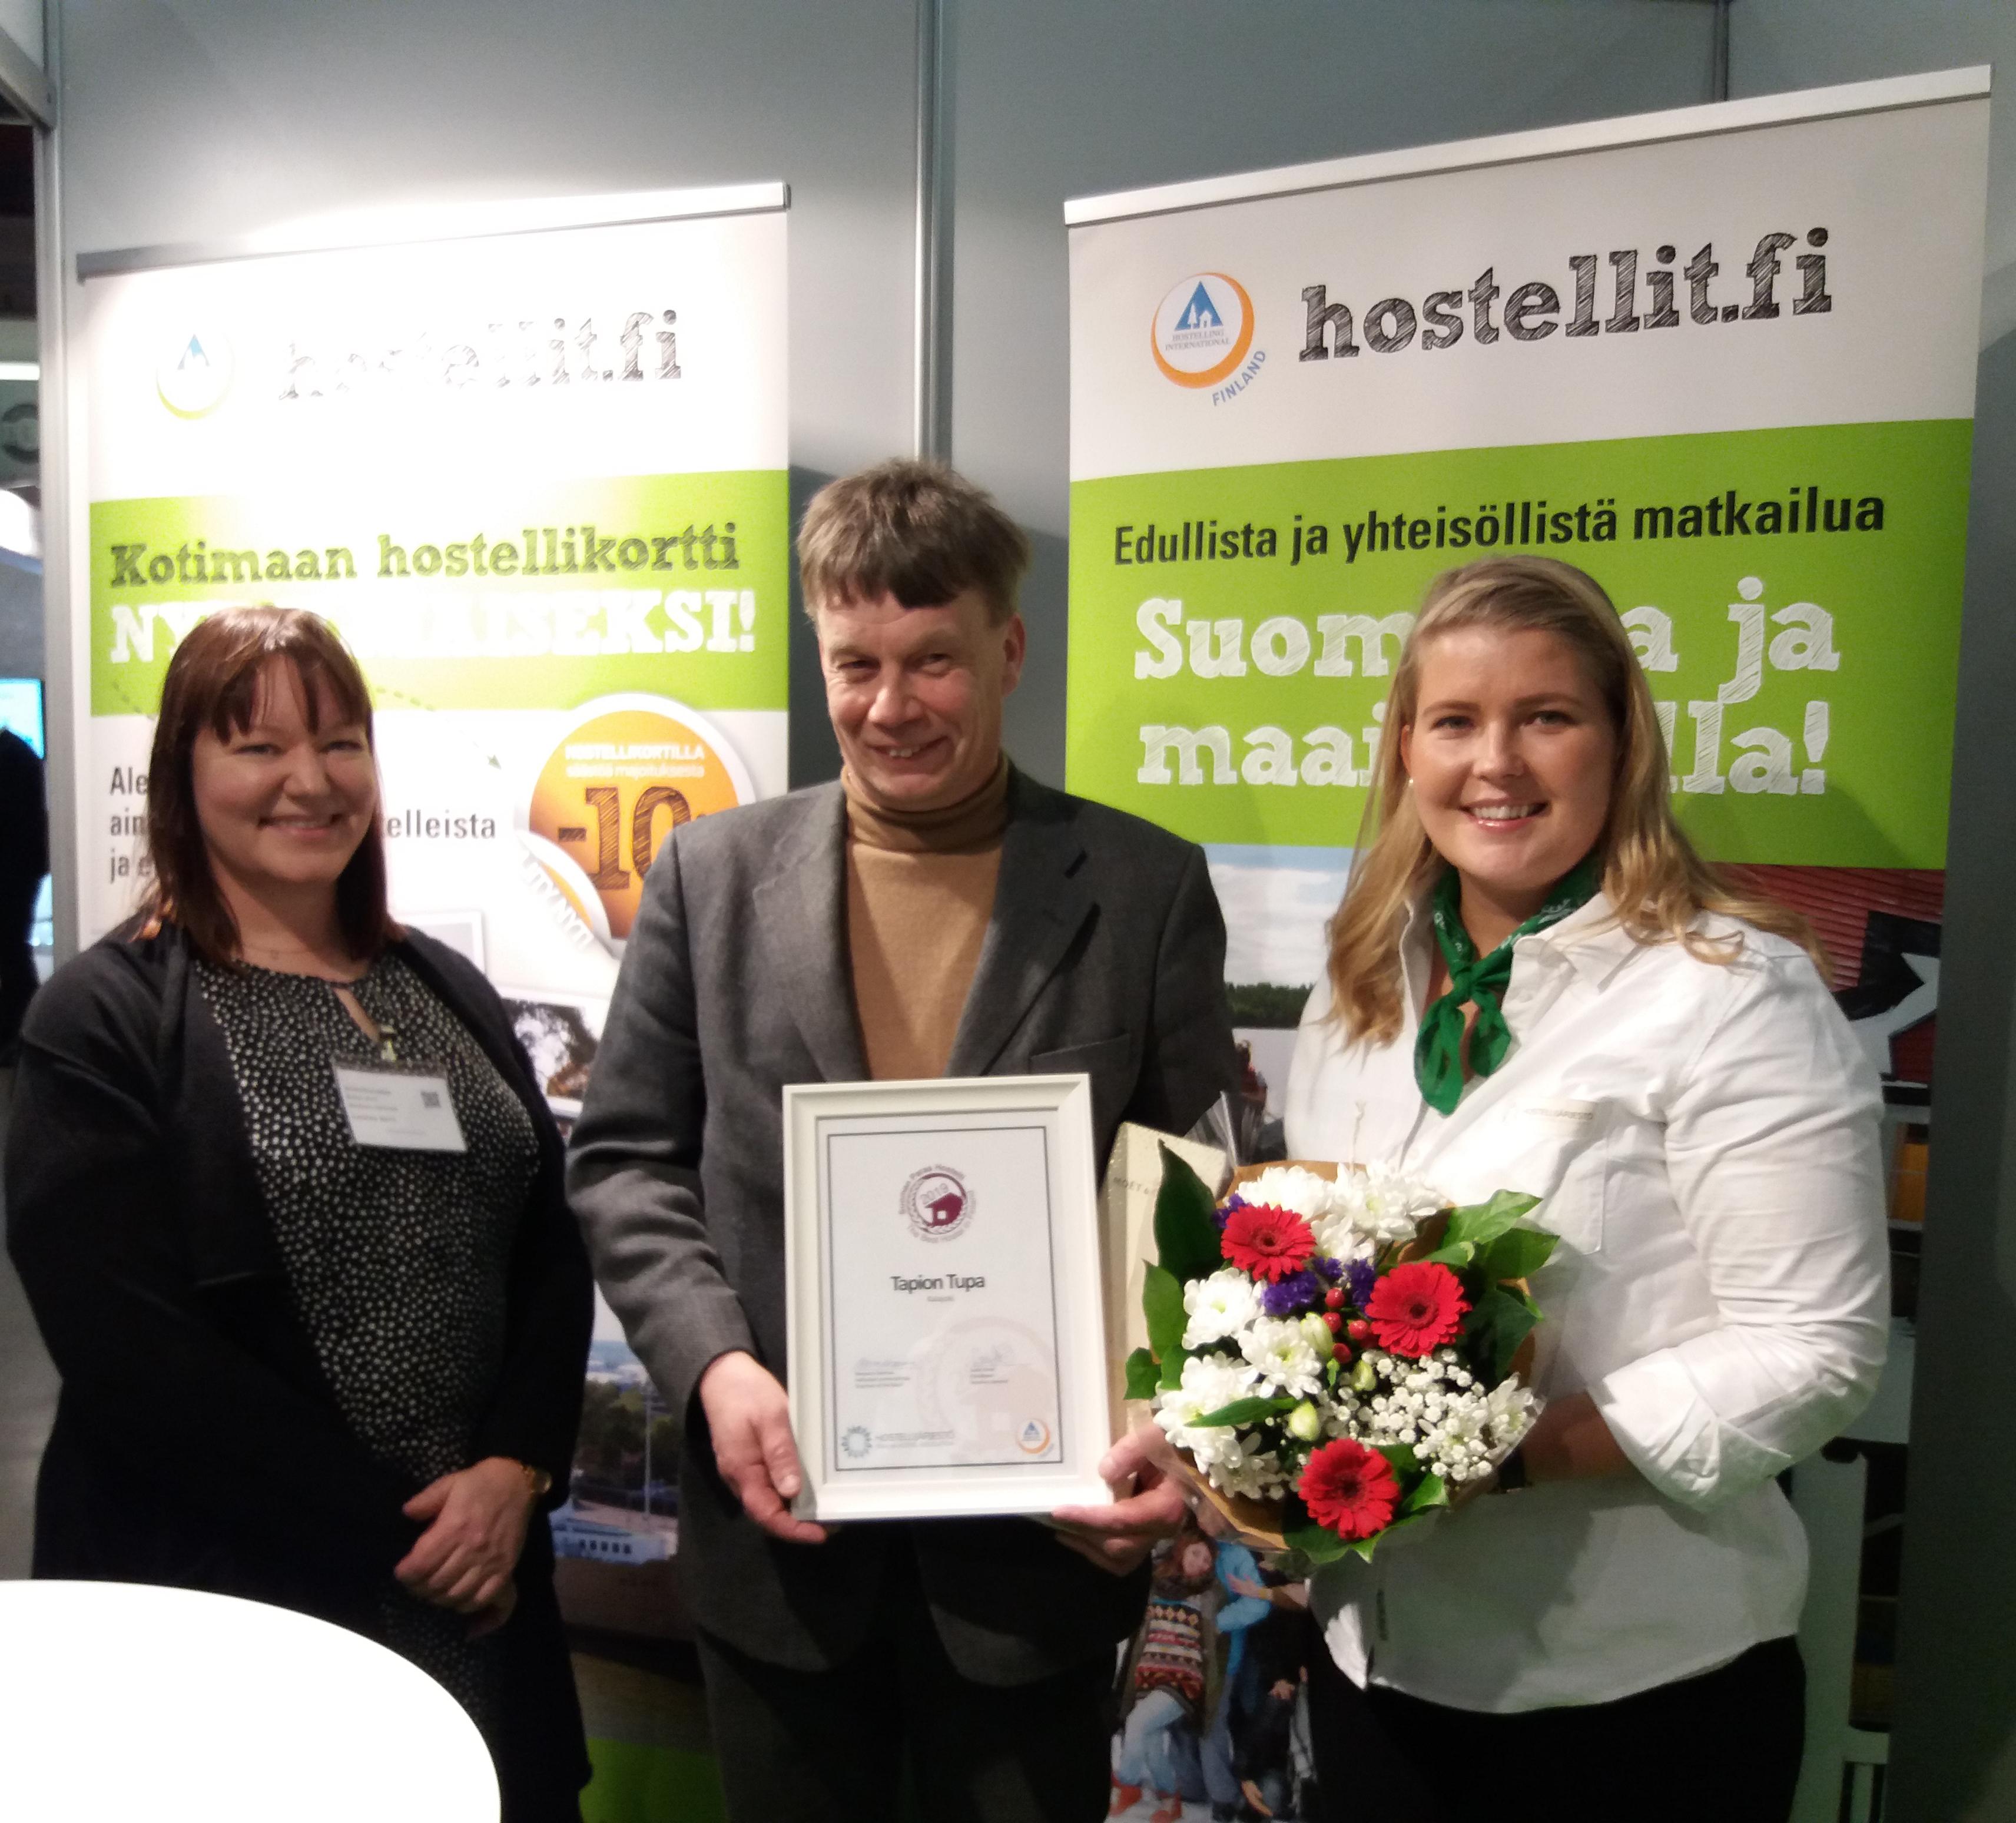 Tapion Tupa on Suomen Paras Hostelli 2019